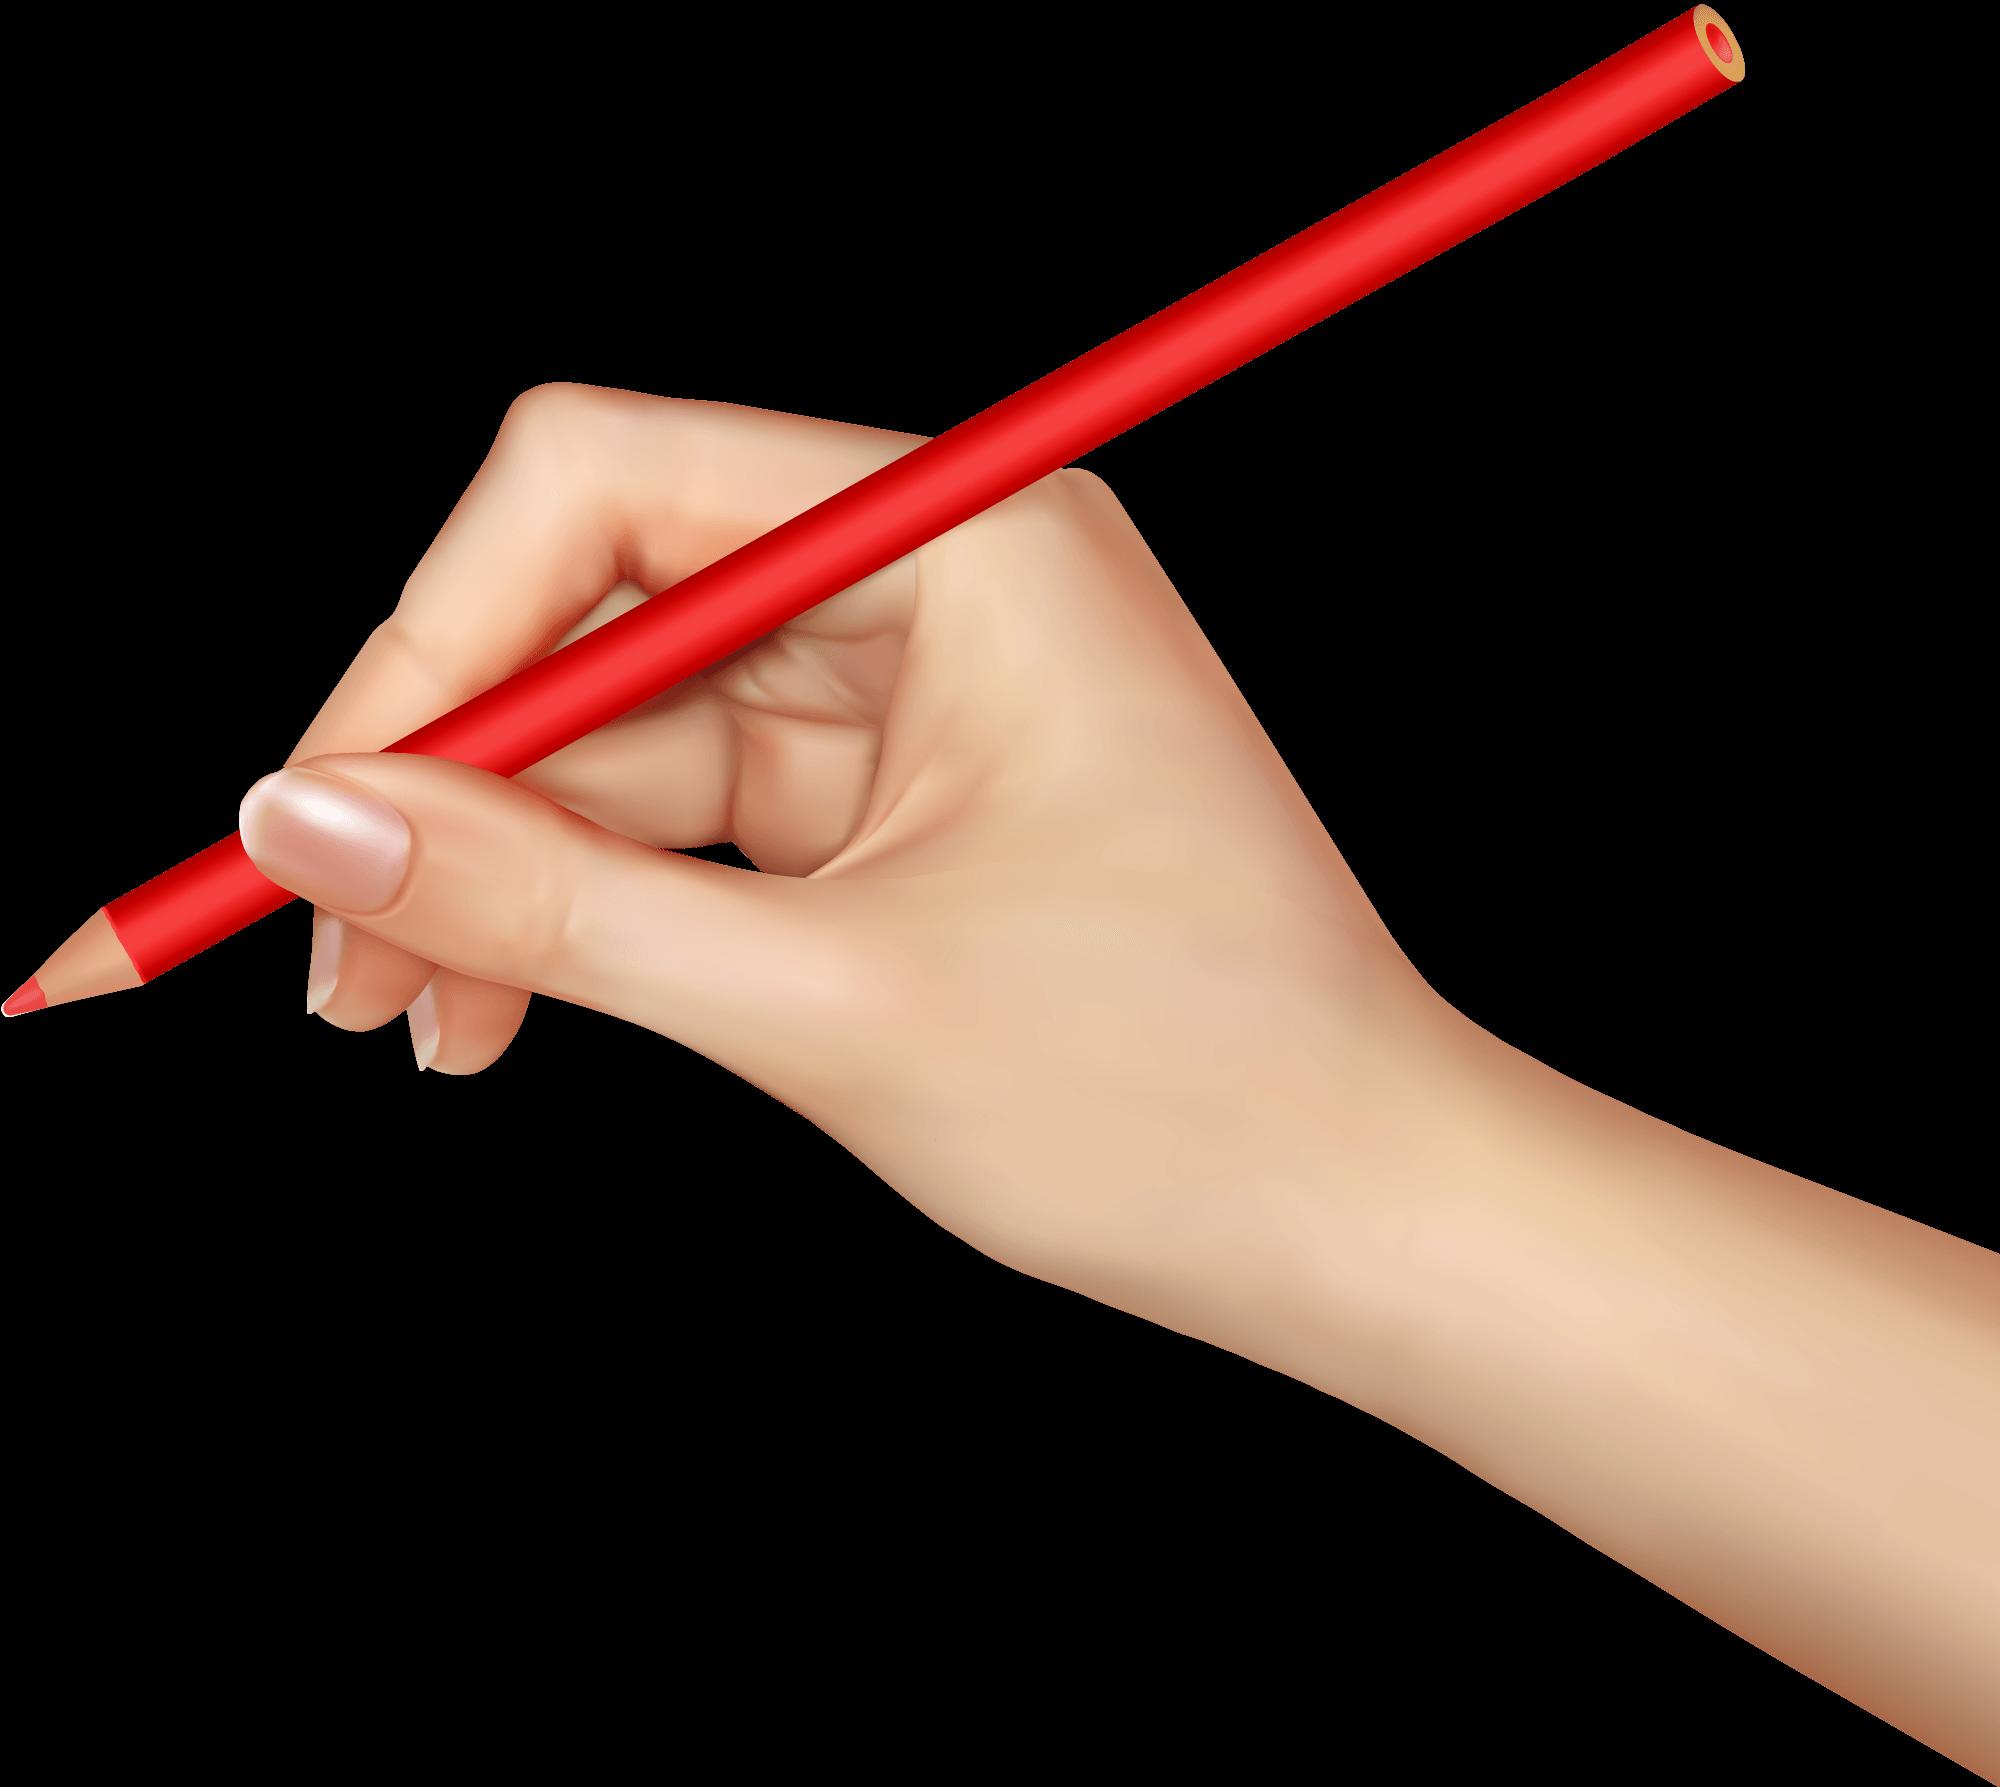 Free Hand Pencil Cliparts, Download Free Clip Art, Free Clip.